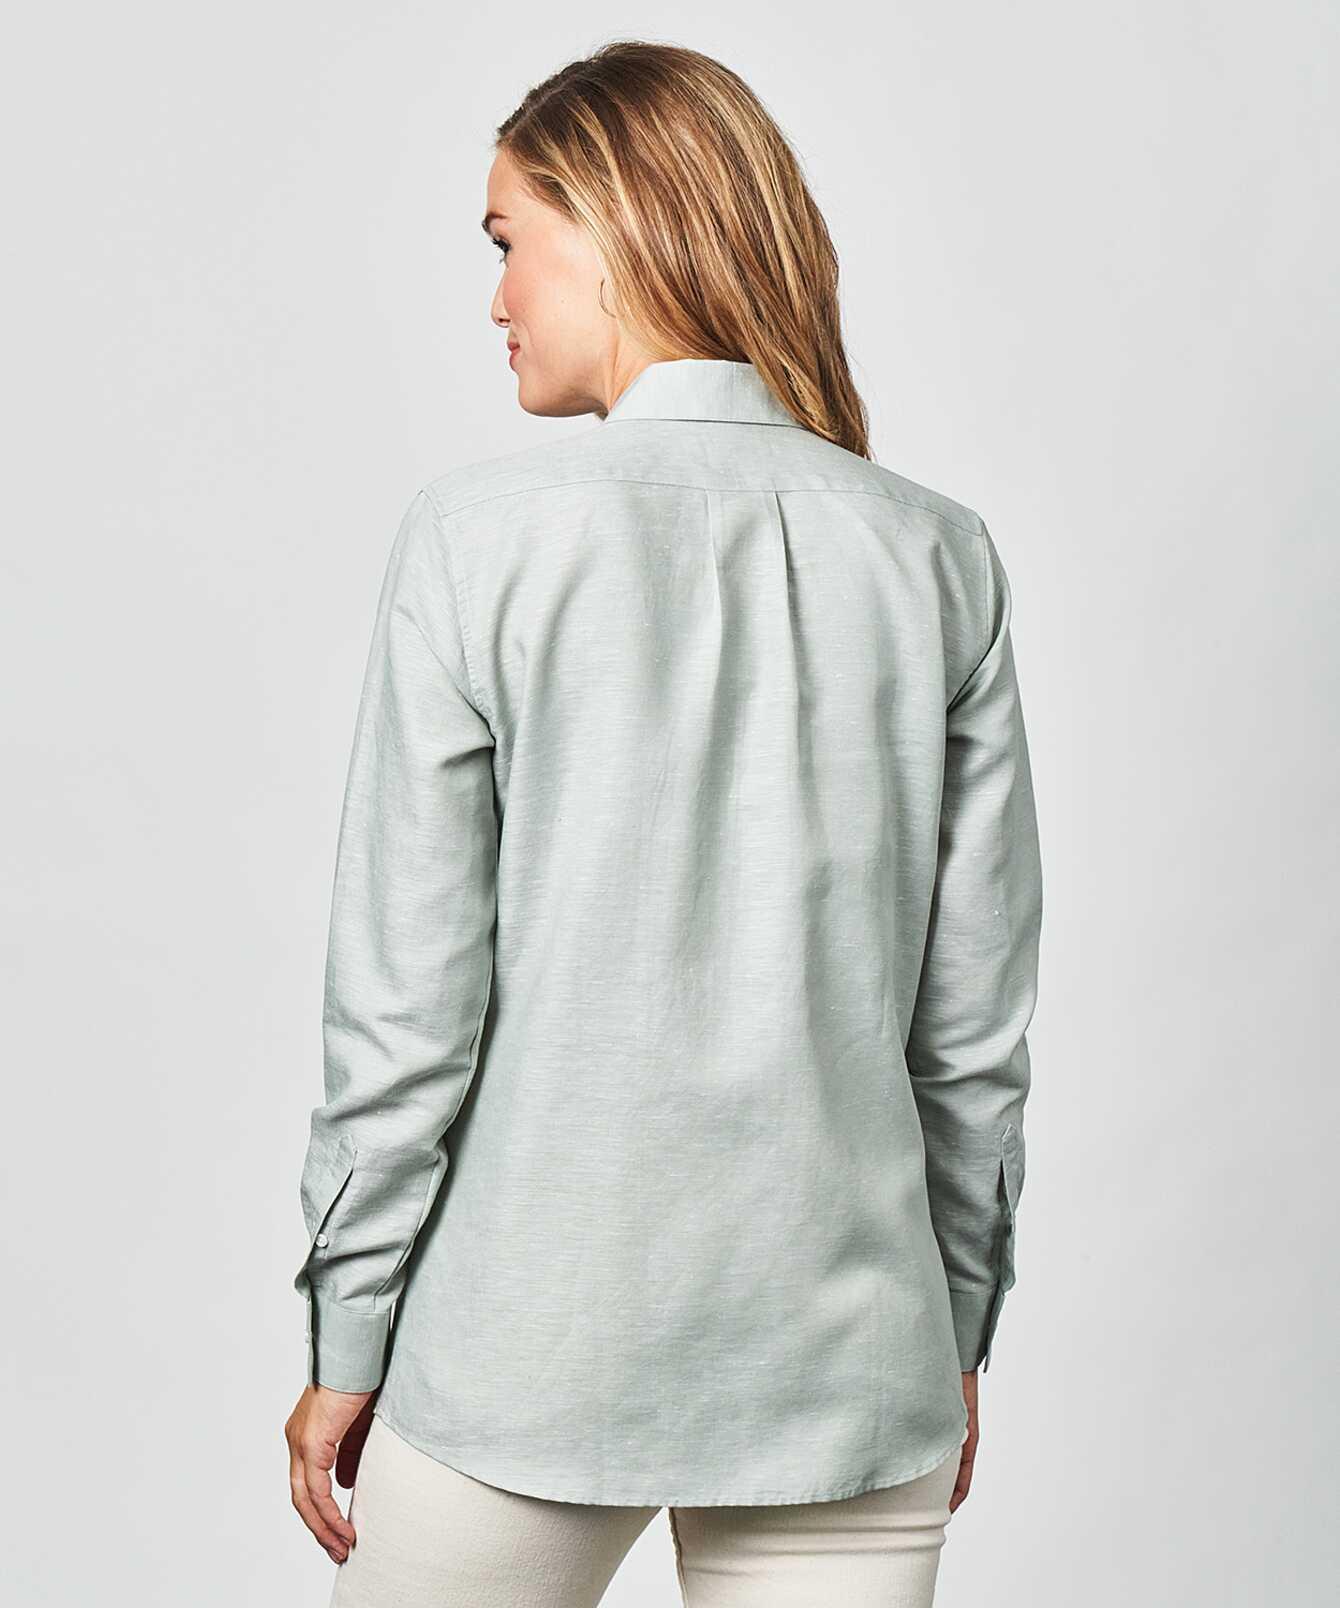 Skjorta Mickan Portofino Pistage The Shirt Factory